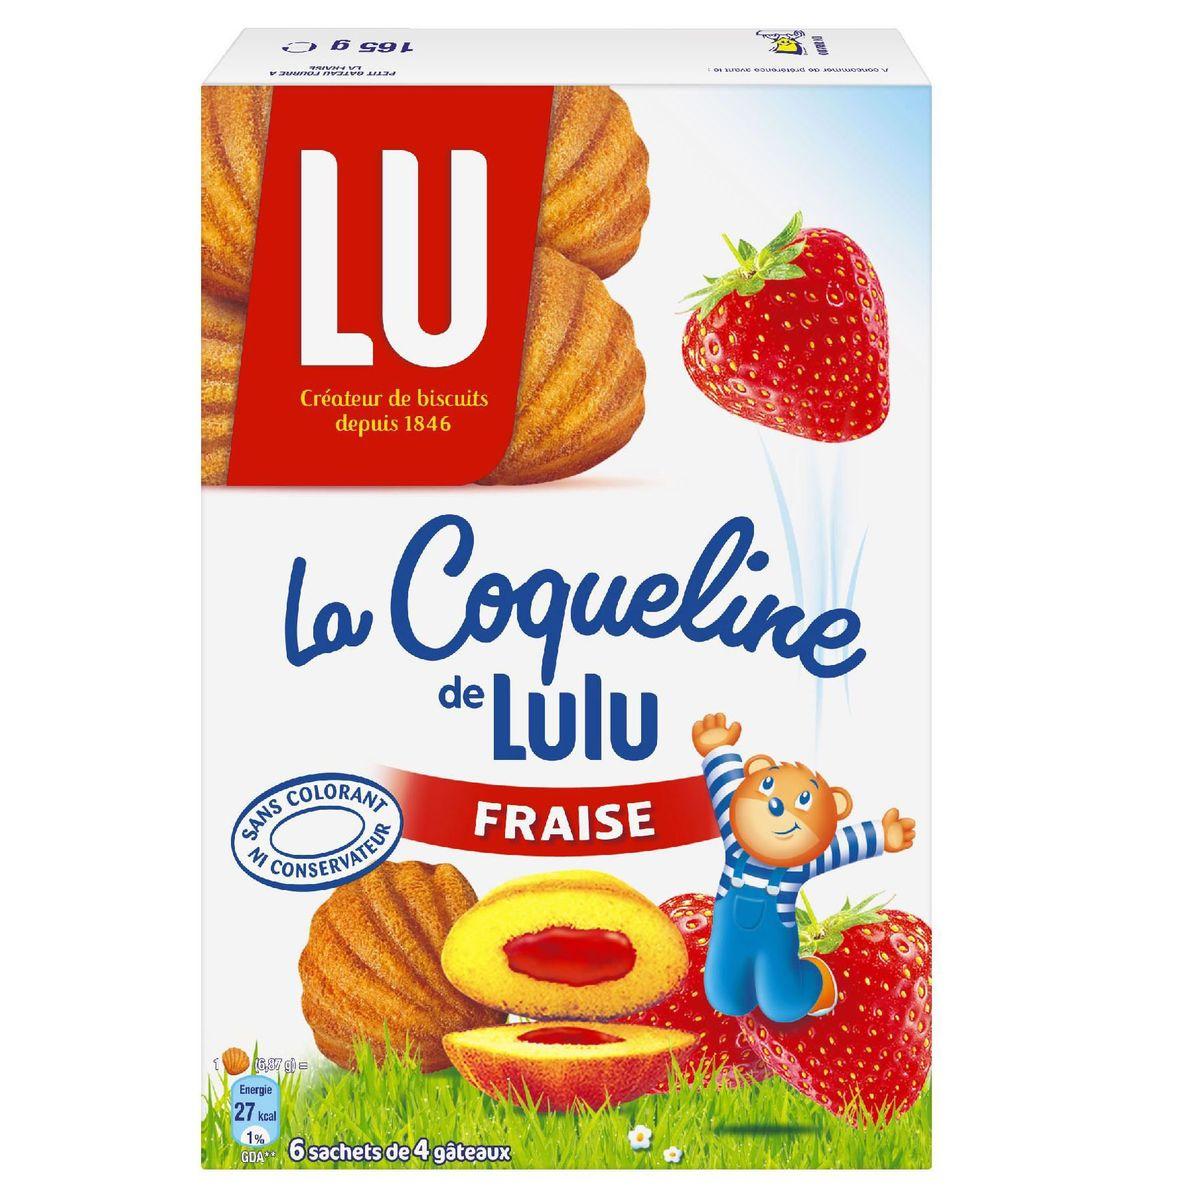 Lulu Coqueline aux fraises, Lu (165 g)